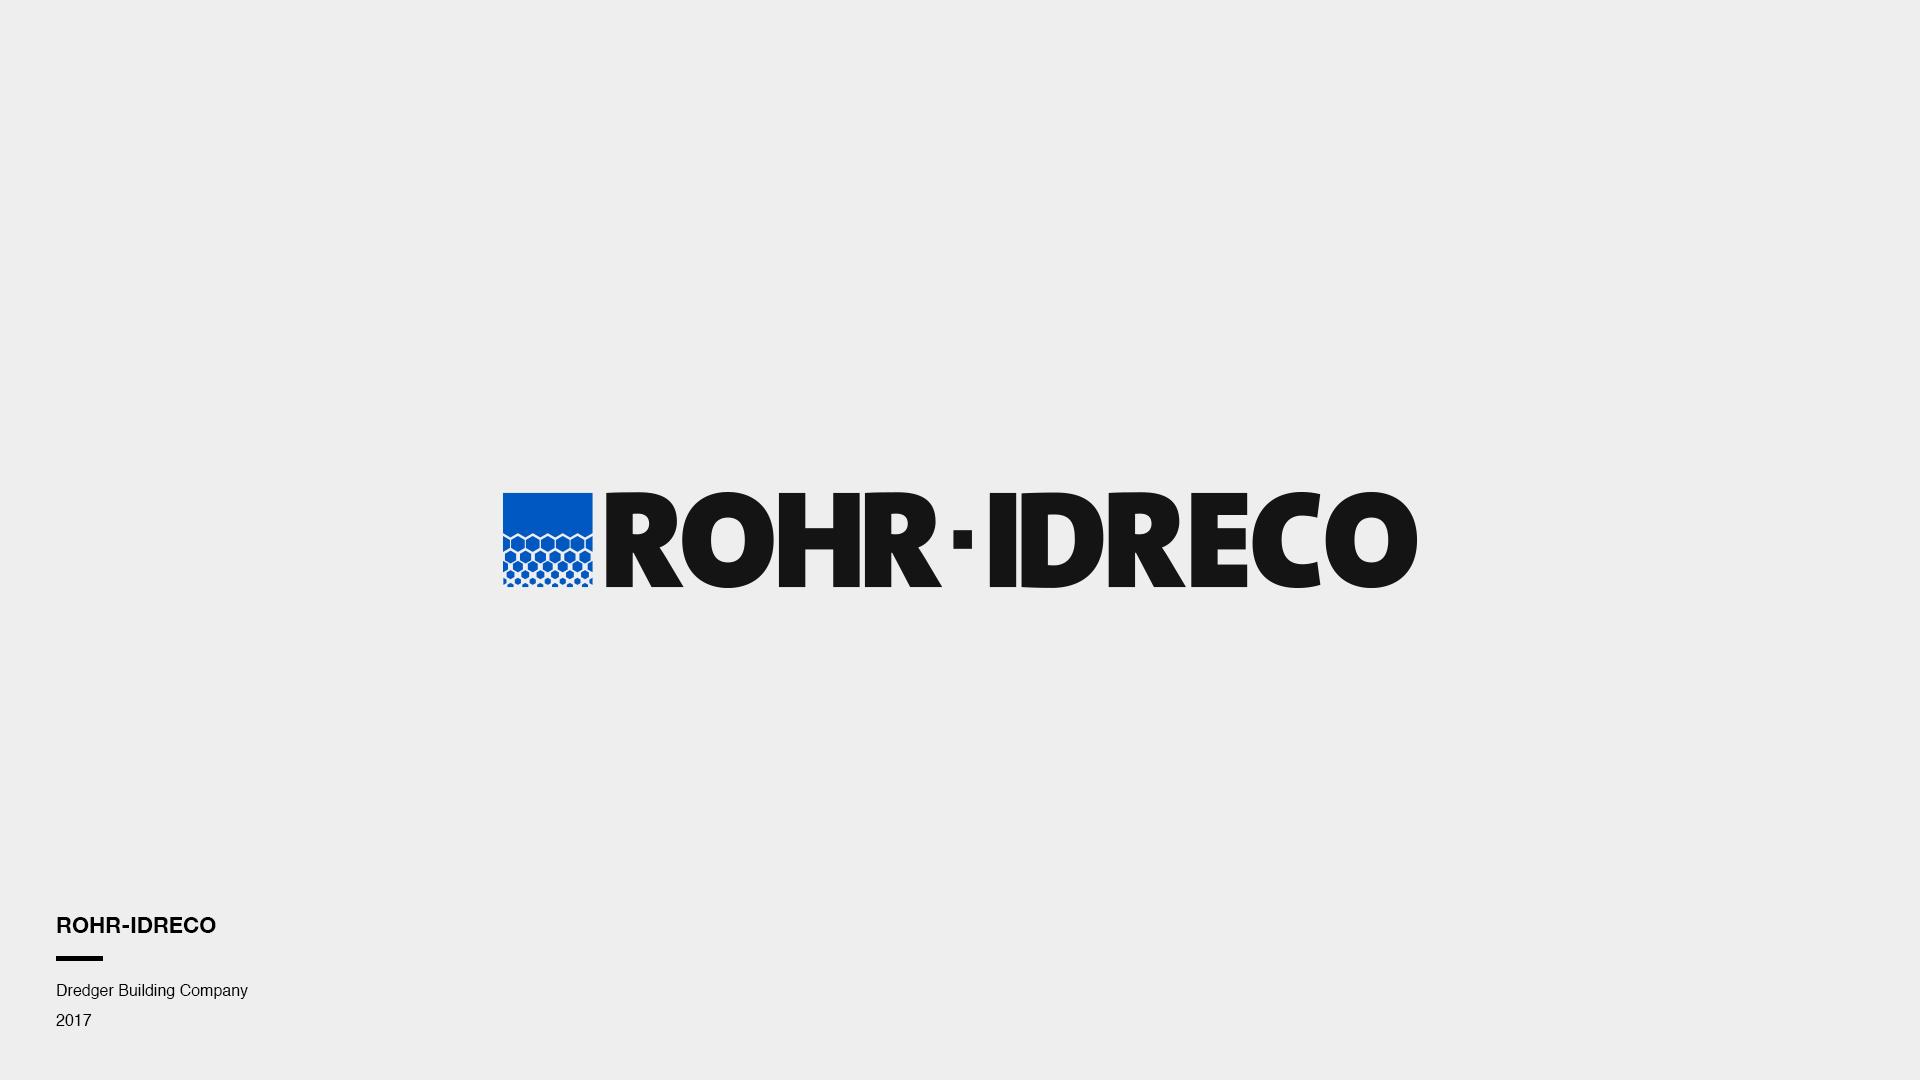 Logo ROHR-IDRECO